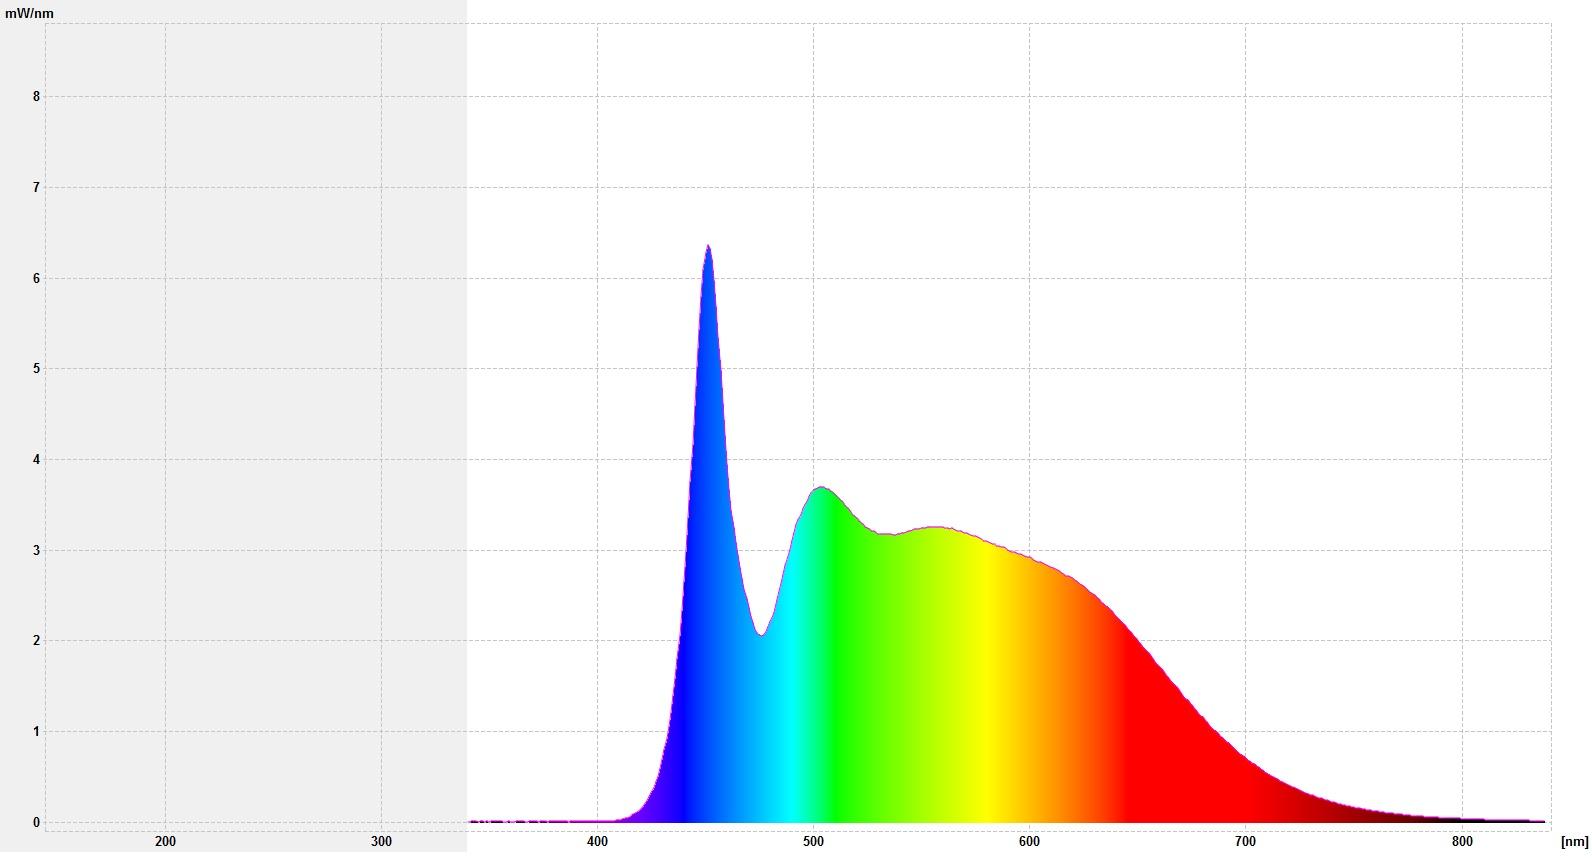 led-lampe-4-5-watt-e14-vollspektrum-tageslichtlampen-natur-nah-nn3513C5vWDhXSPPqAENAQln5LsnXaCd